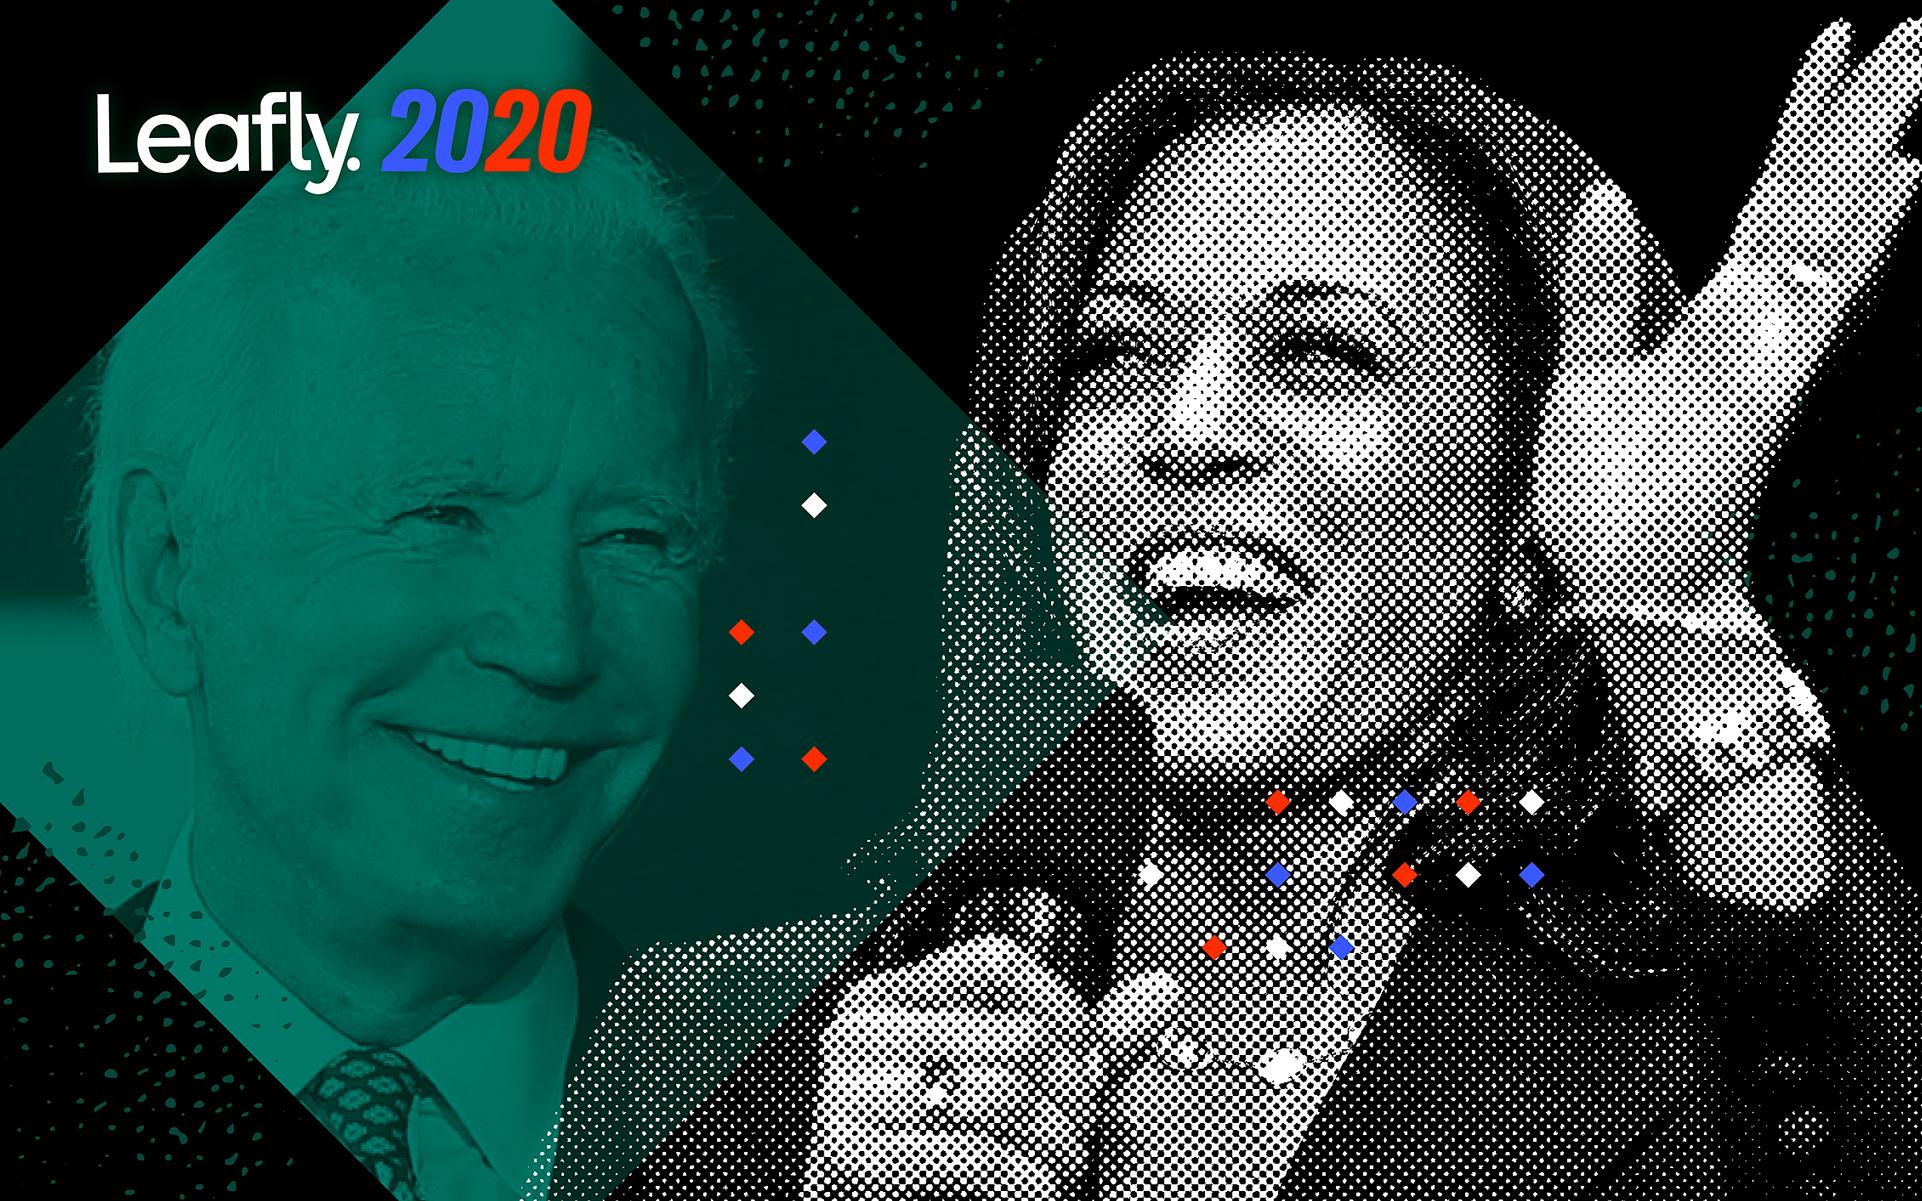 BidenVP v2 Ed 1921x1201%401x - Cannabis leaders react to Biden's choice of Kamala Harris: Will she help or hurt marijuana legalization?